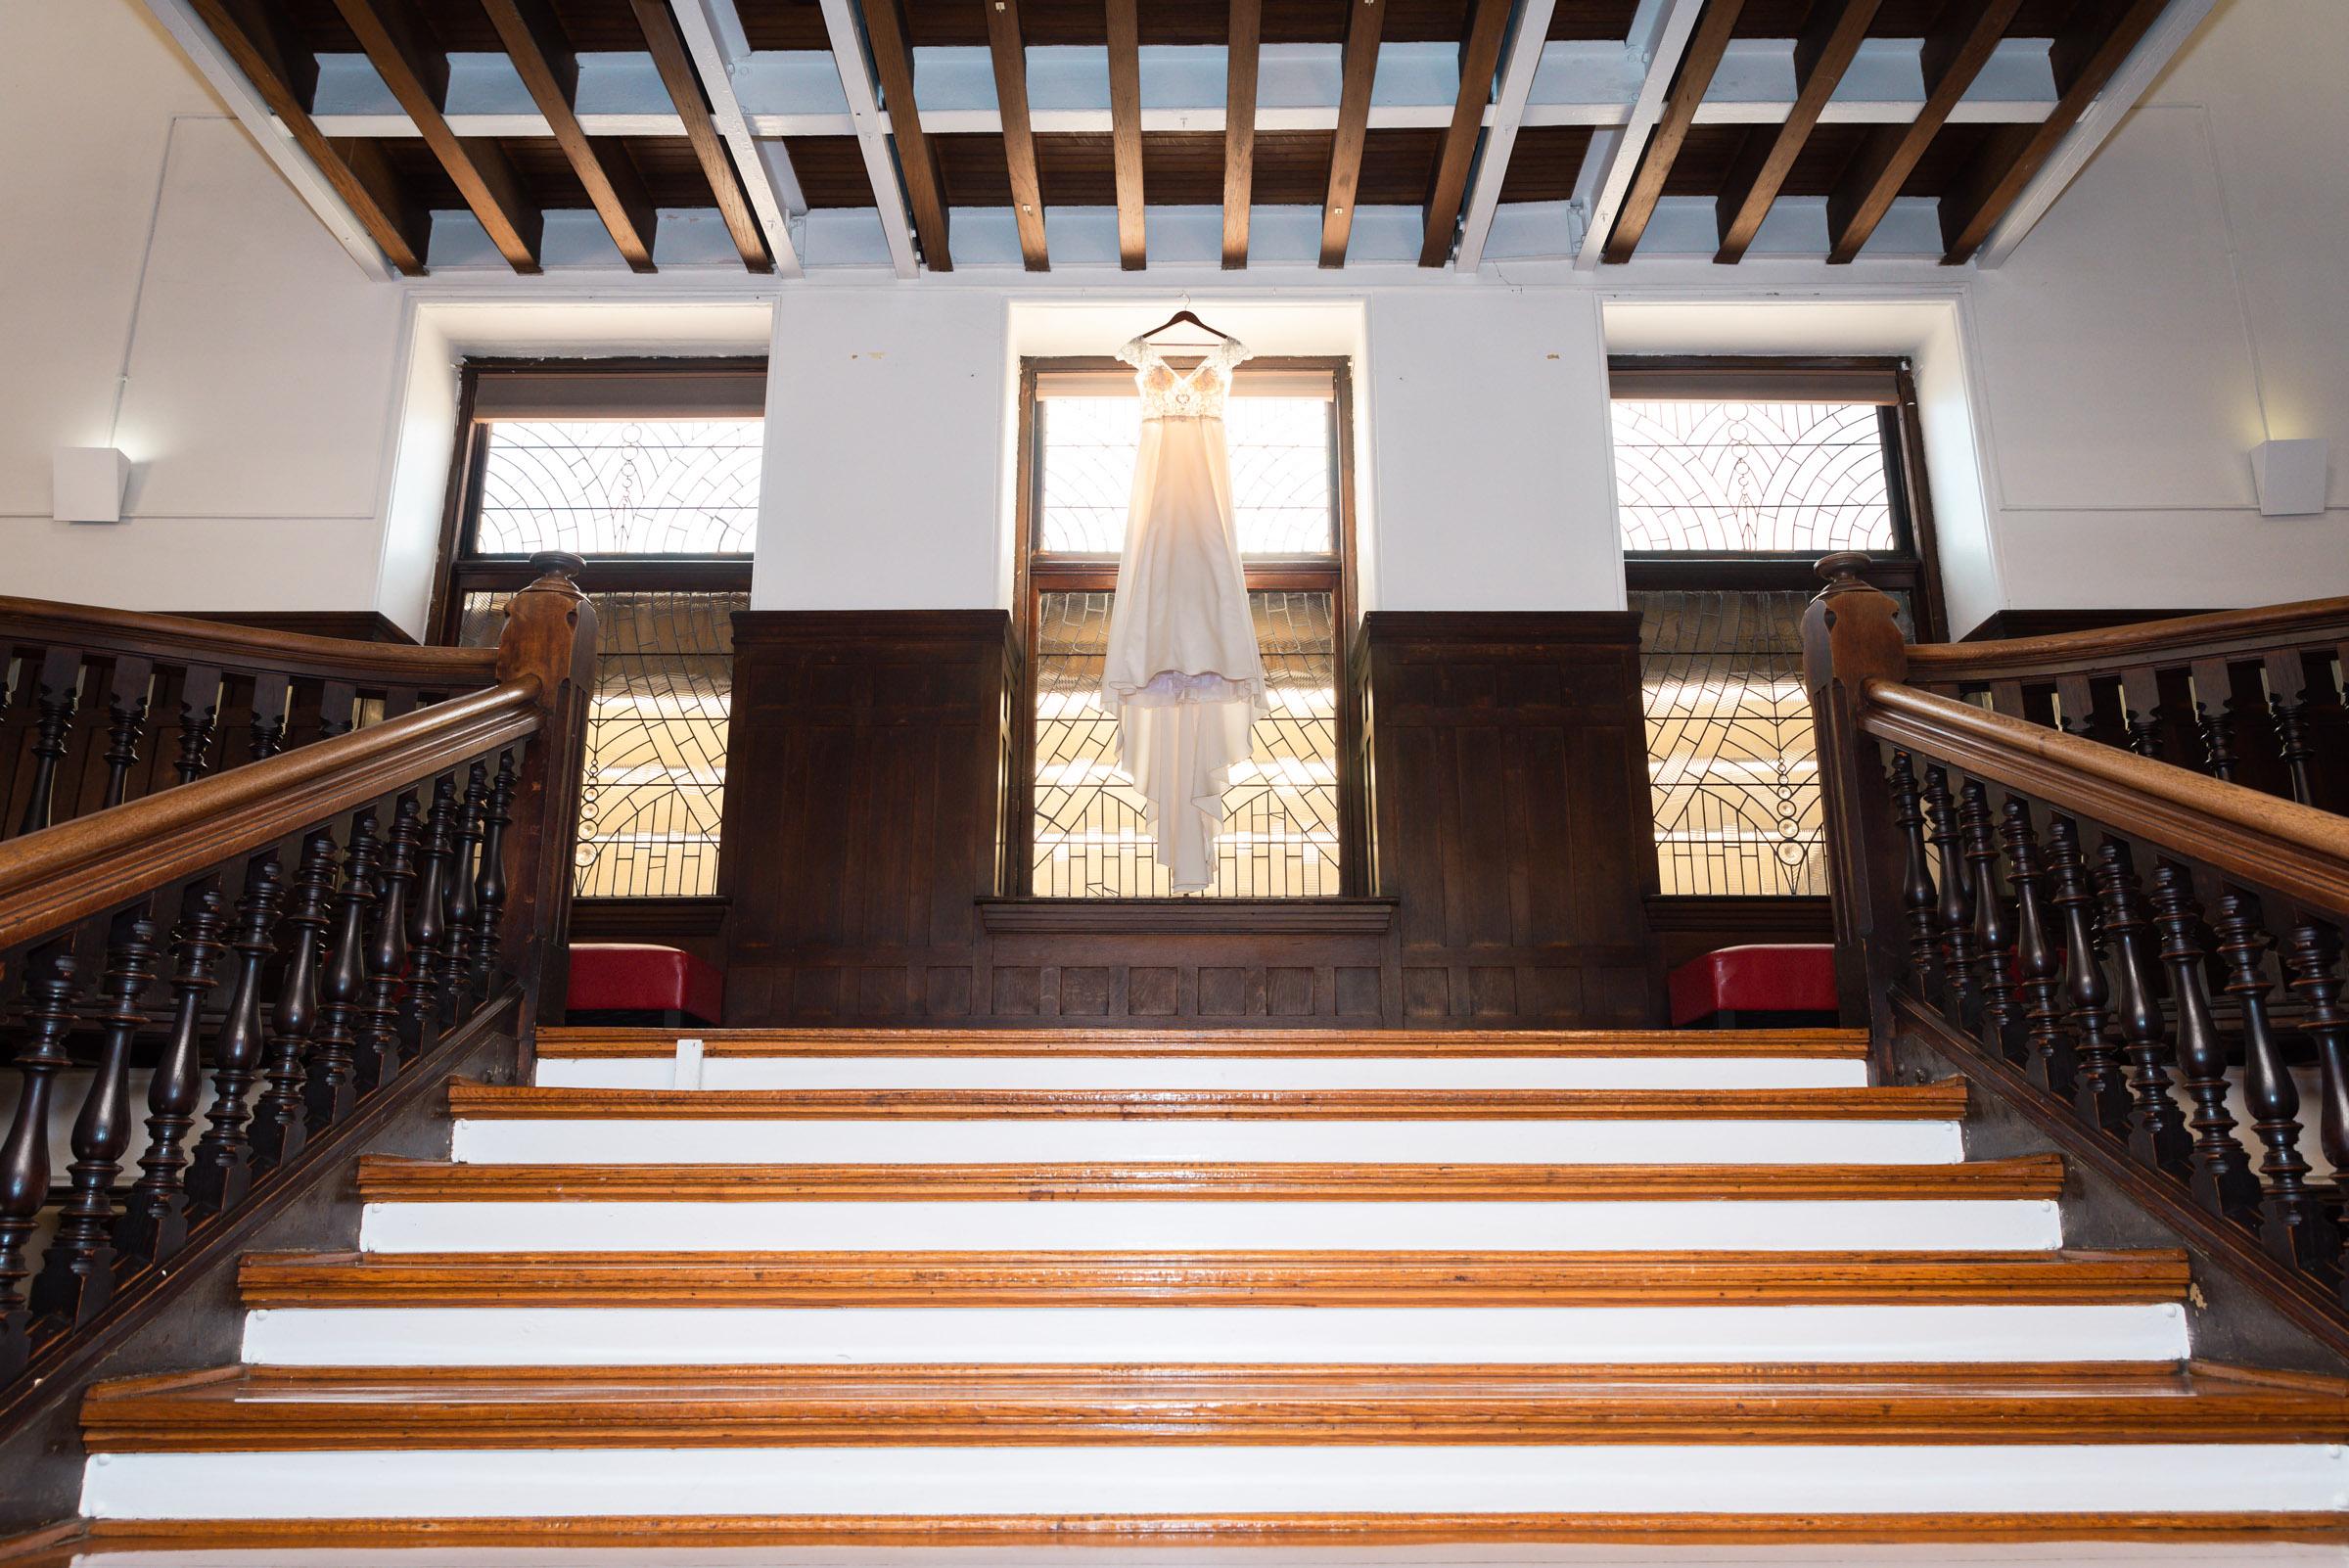 The Baldwin School wedding dress hanging on stairwell